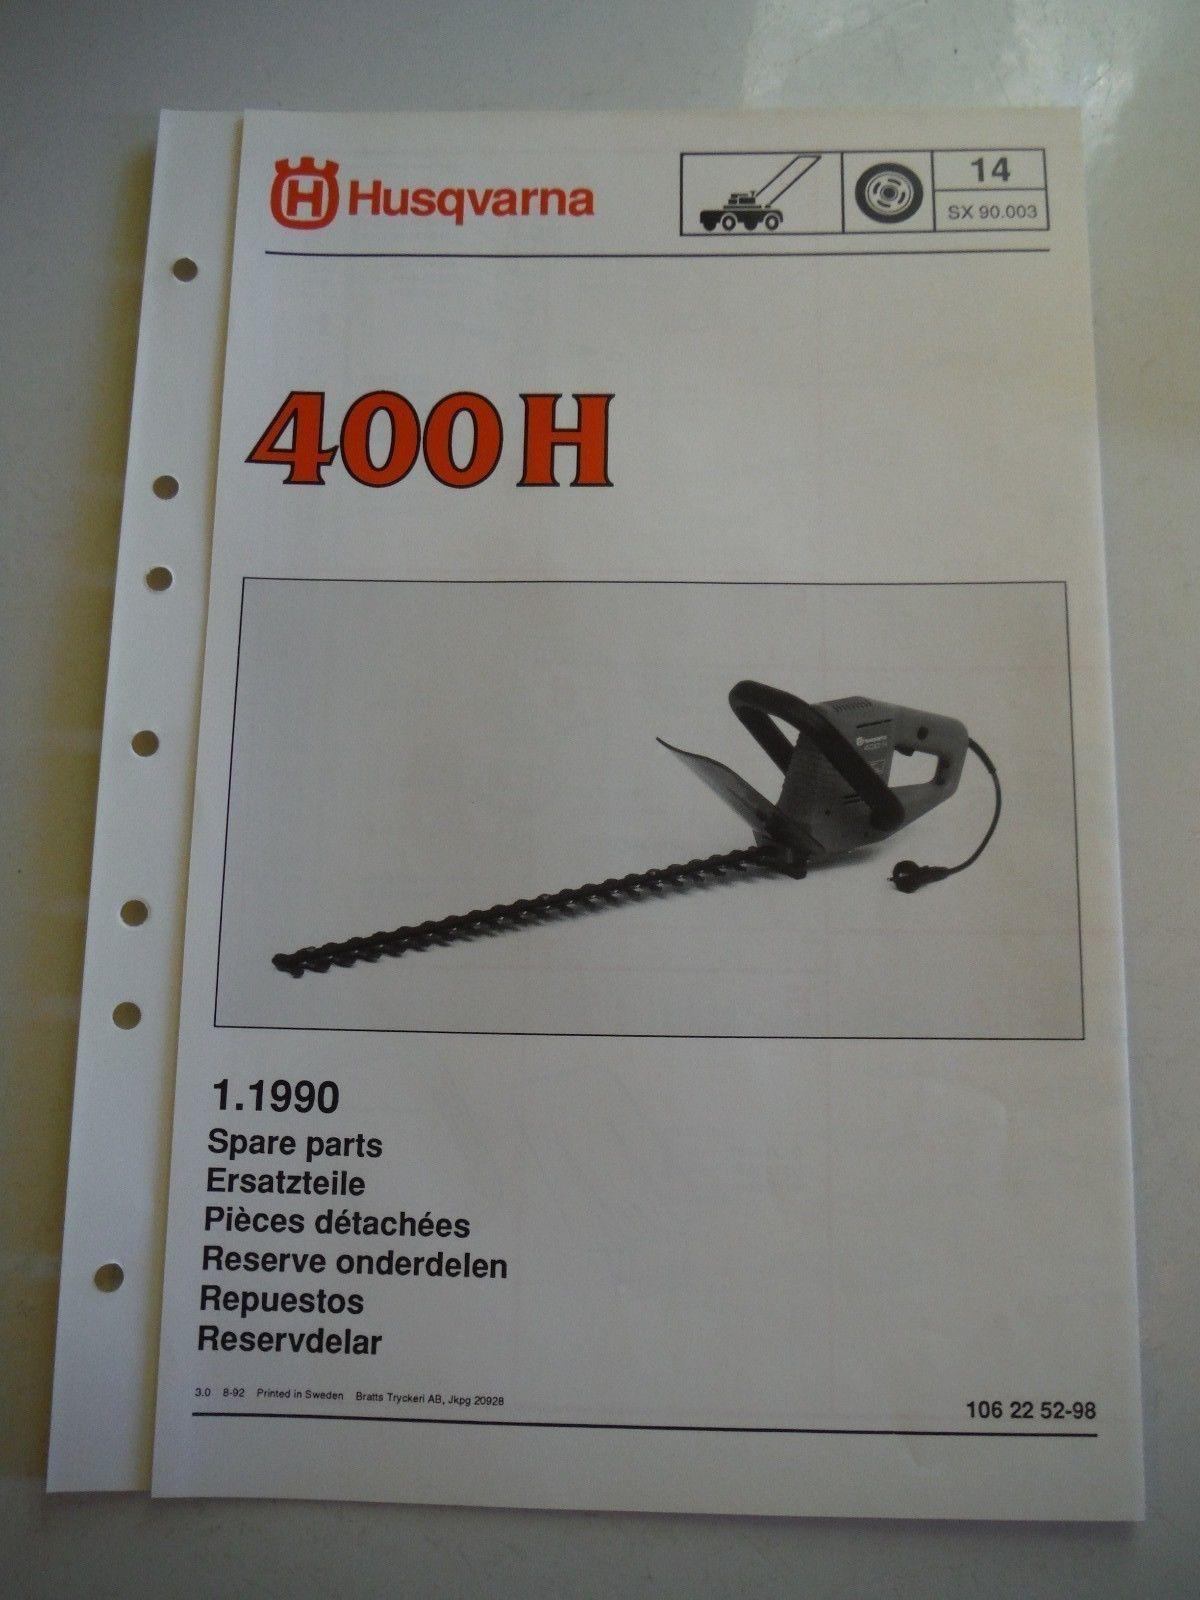 husqvarna string trimmer 1990s 5 listings rh bonanza com Husqvarna Toy Trimmer Husqvarna Trimmer 128LD Manual